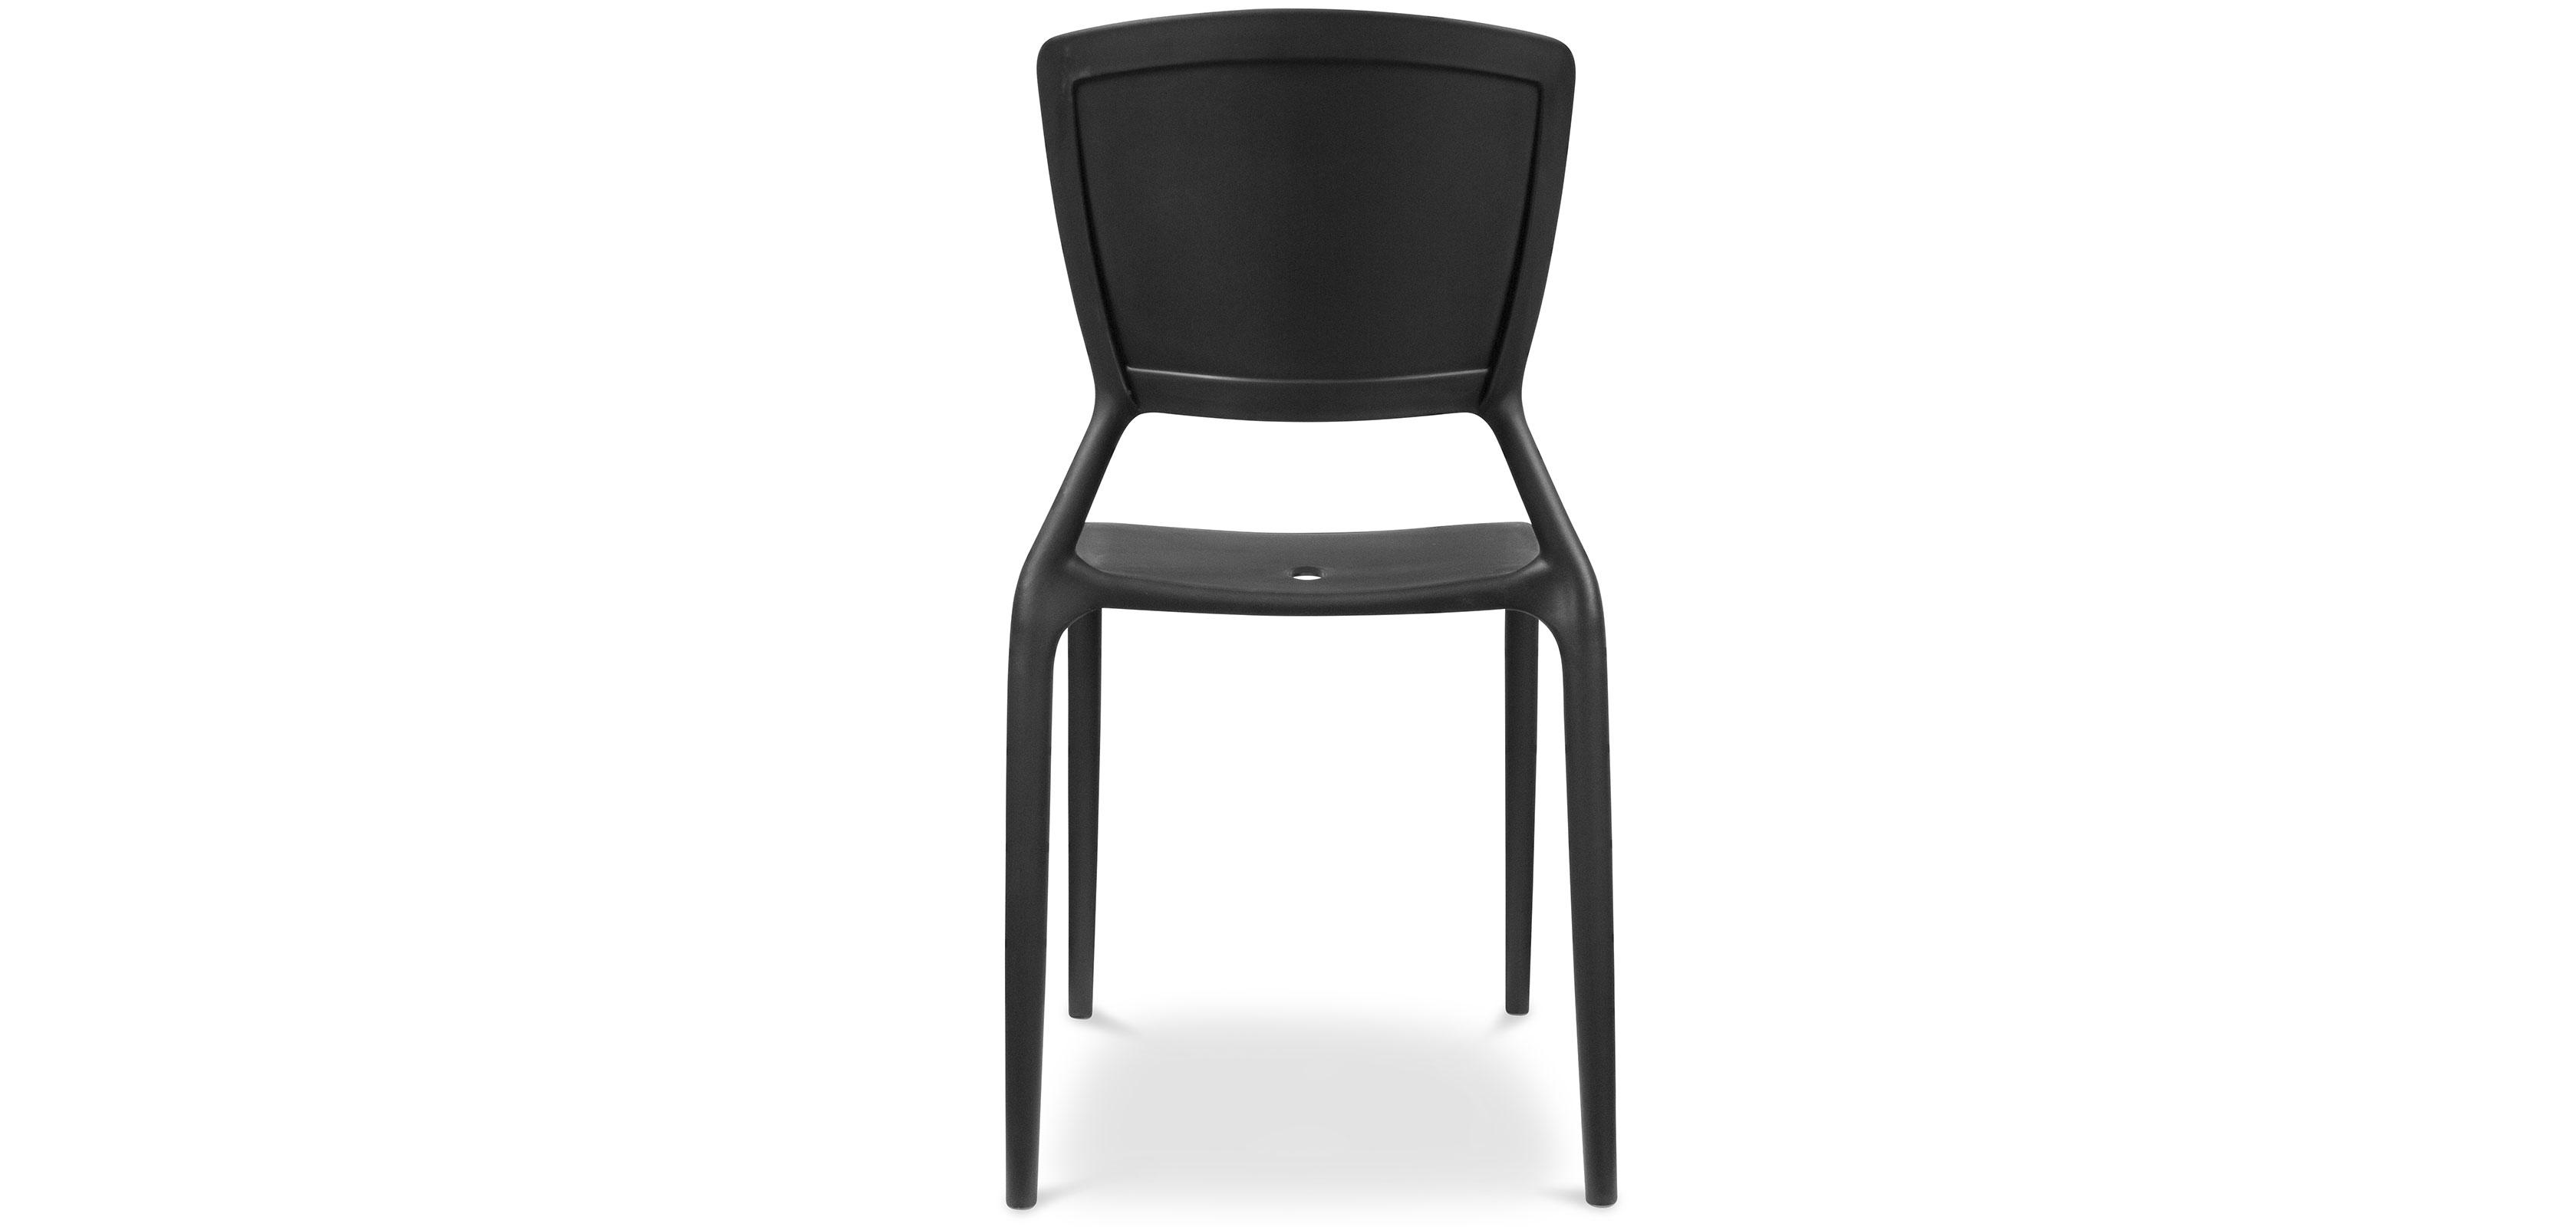 Sedia da pranzo design plana for Sedia design usata